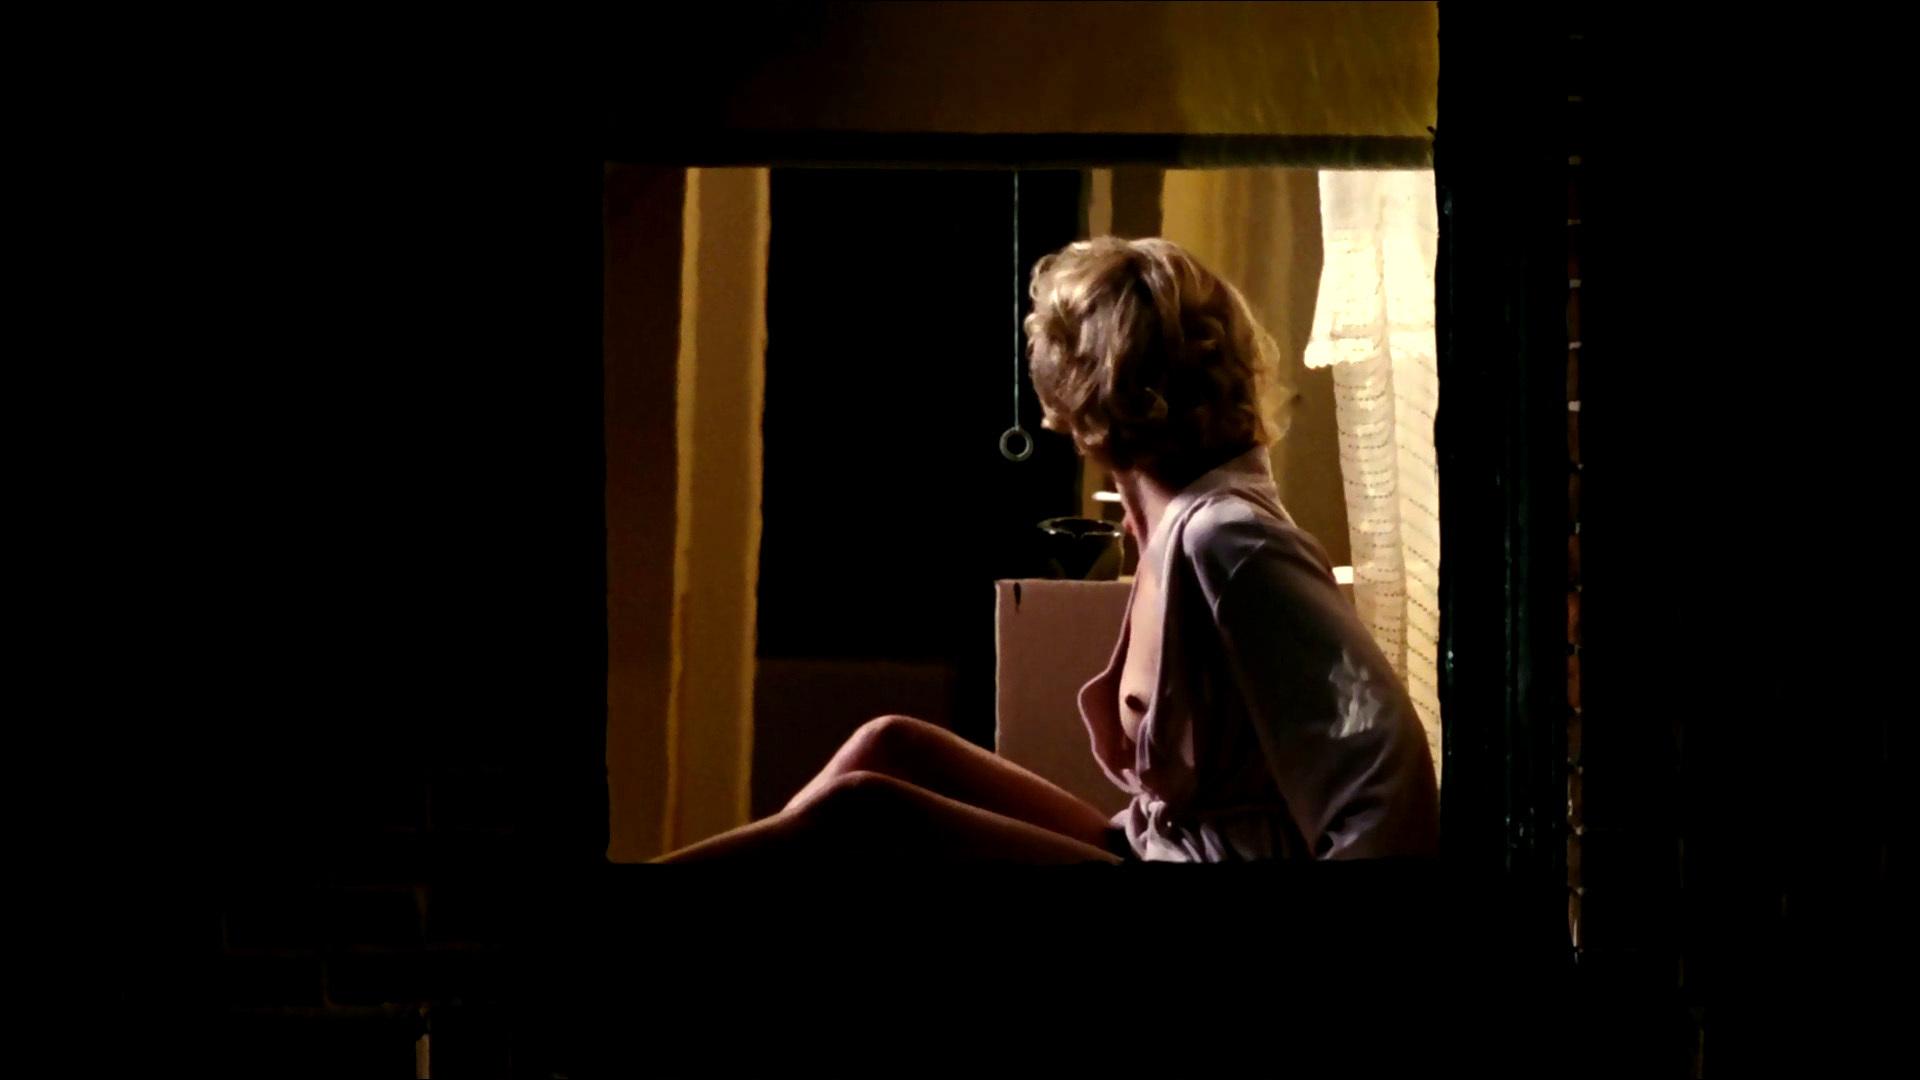 Gretchen Mol - An American Affair HD 1080p 04.jpg